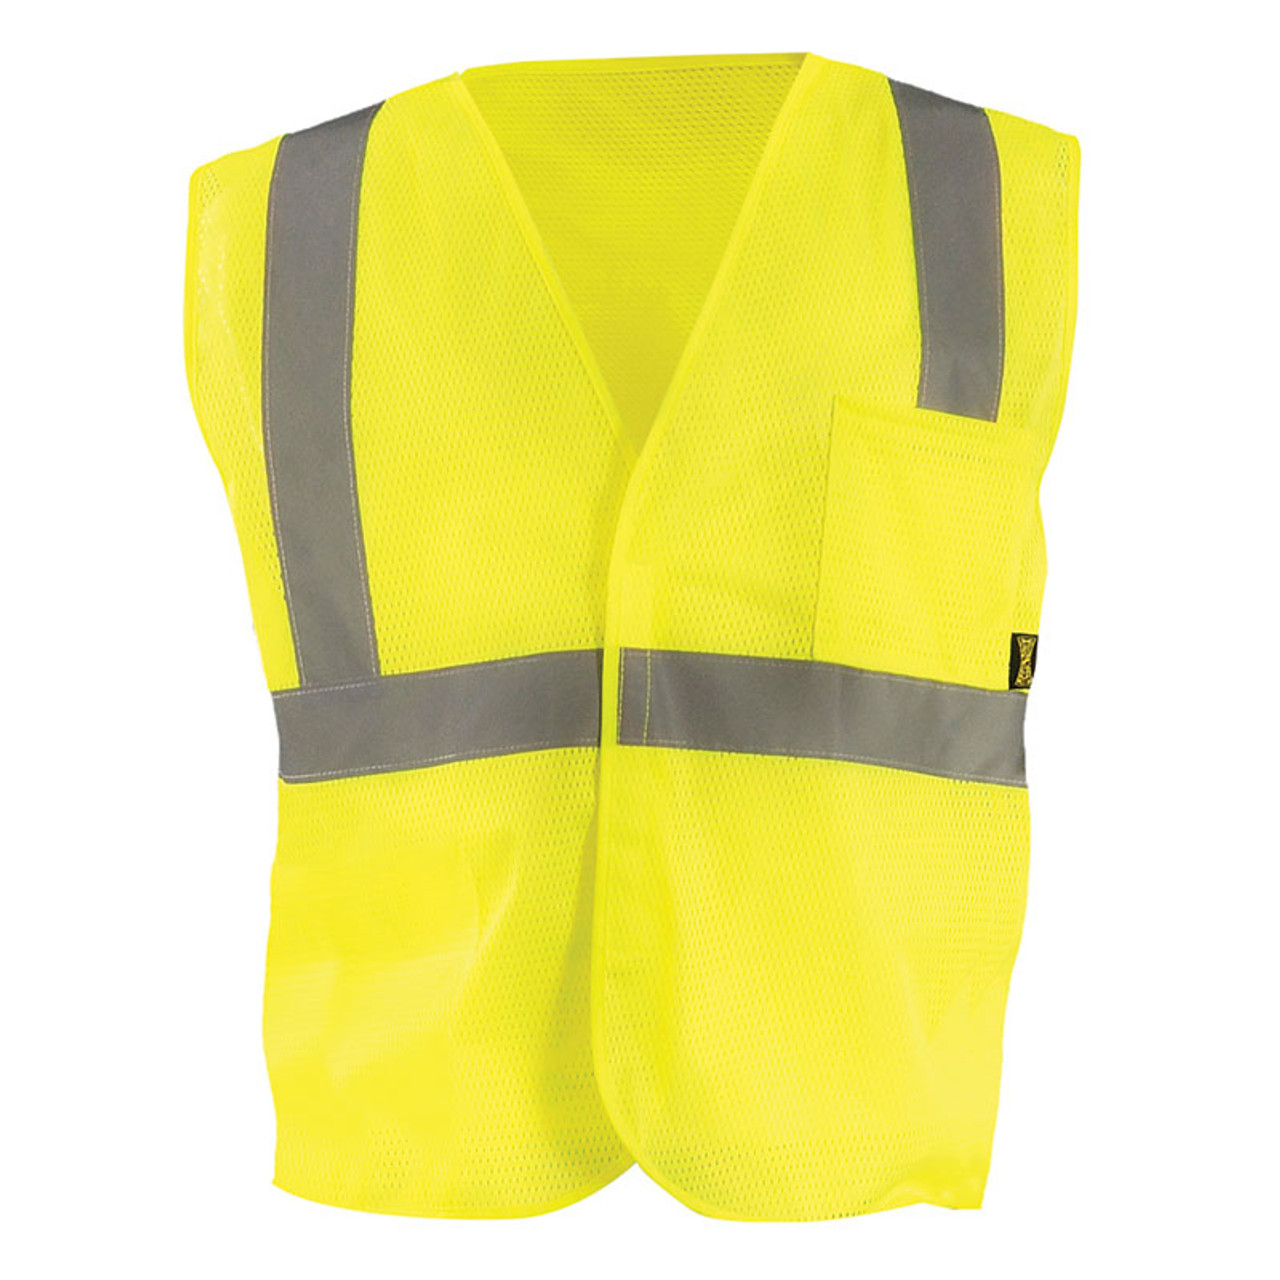 f0d5c6f2948 Occunomix Class 2 Hi Vis Mesh Value Economy Safety Vest ECO-IM Yellow Front